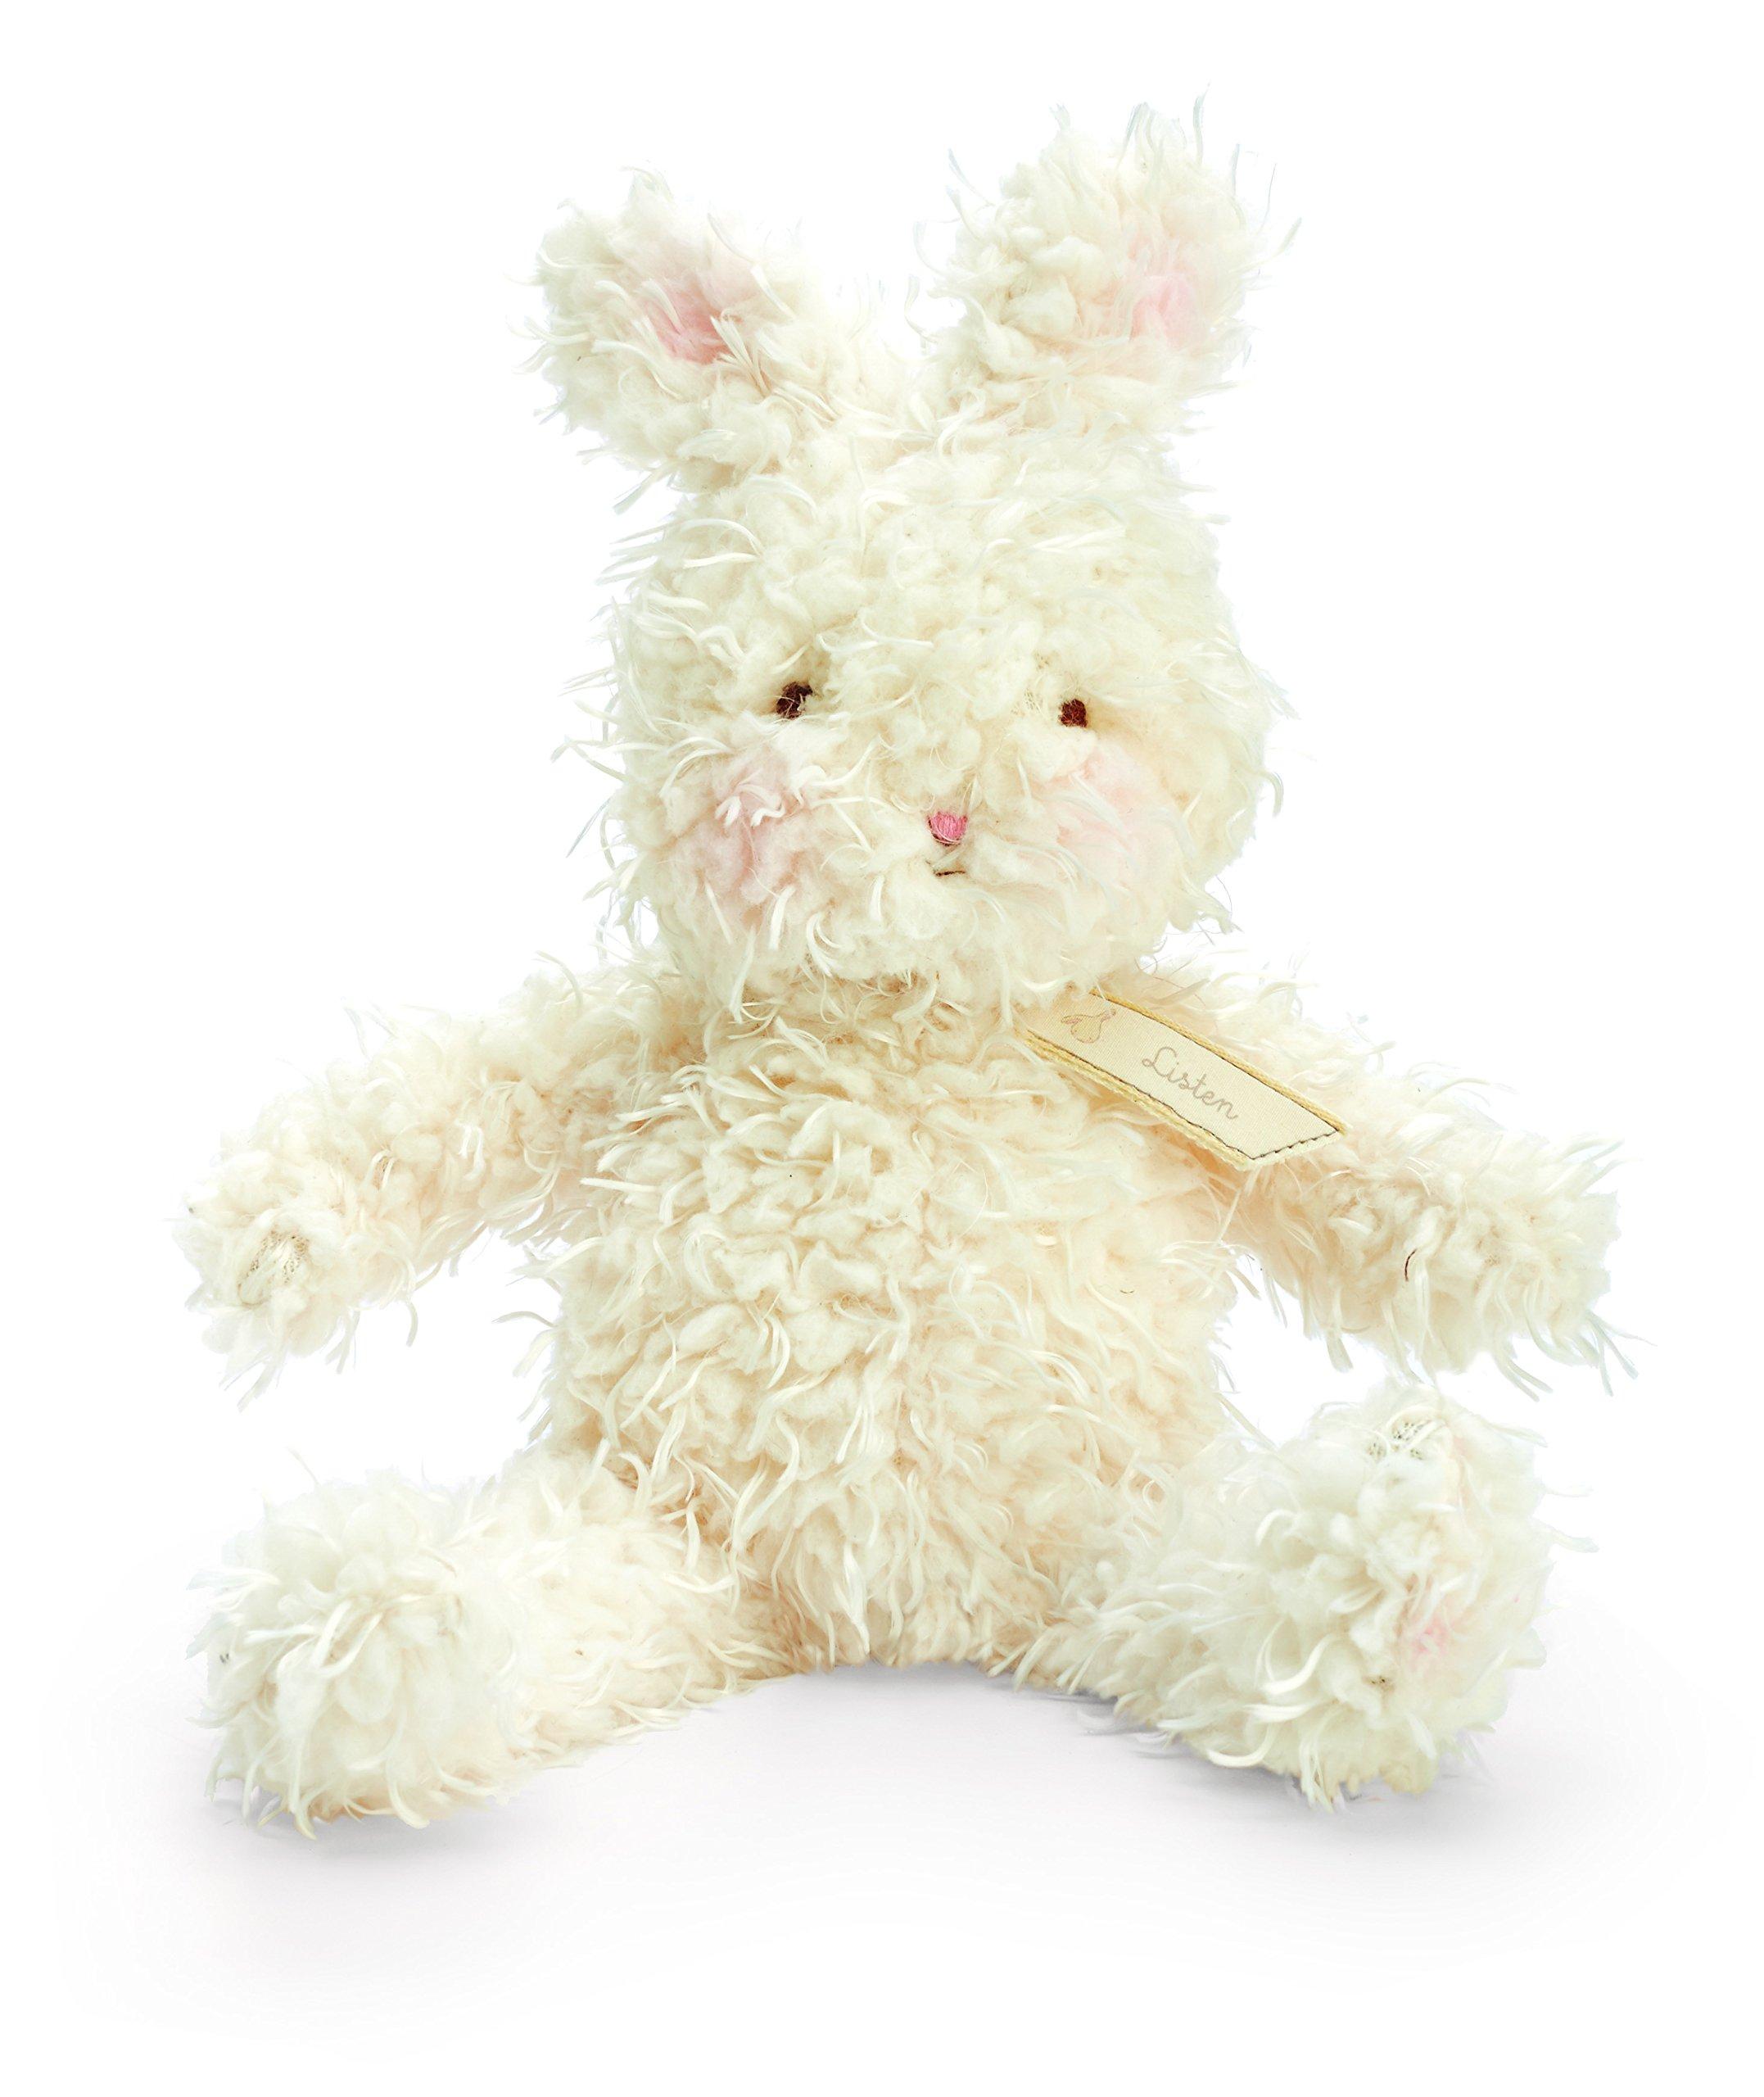 e988bff98 Amazon.com  Bunnies By The Bay Shaggy Hoppy Bunny Plush Toy